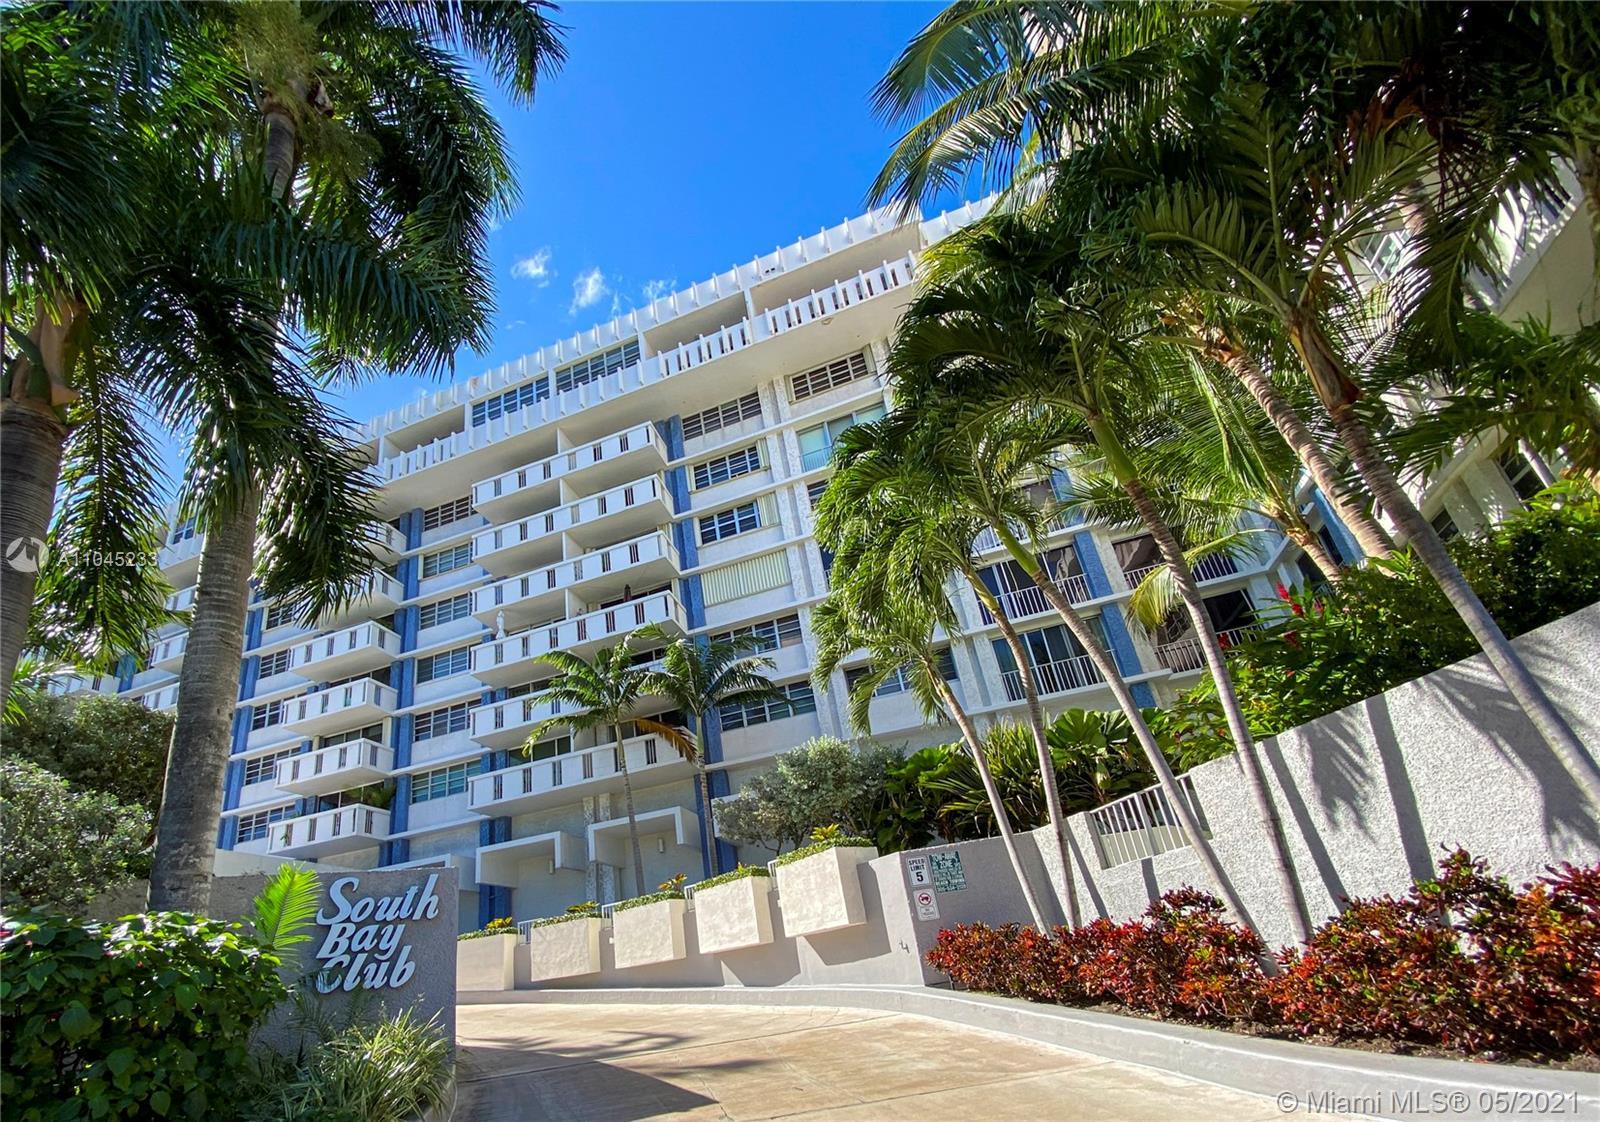 South Bay Club #738 - 800 West Ave #738, Miami Beach, FL 33139